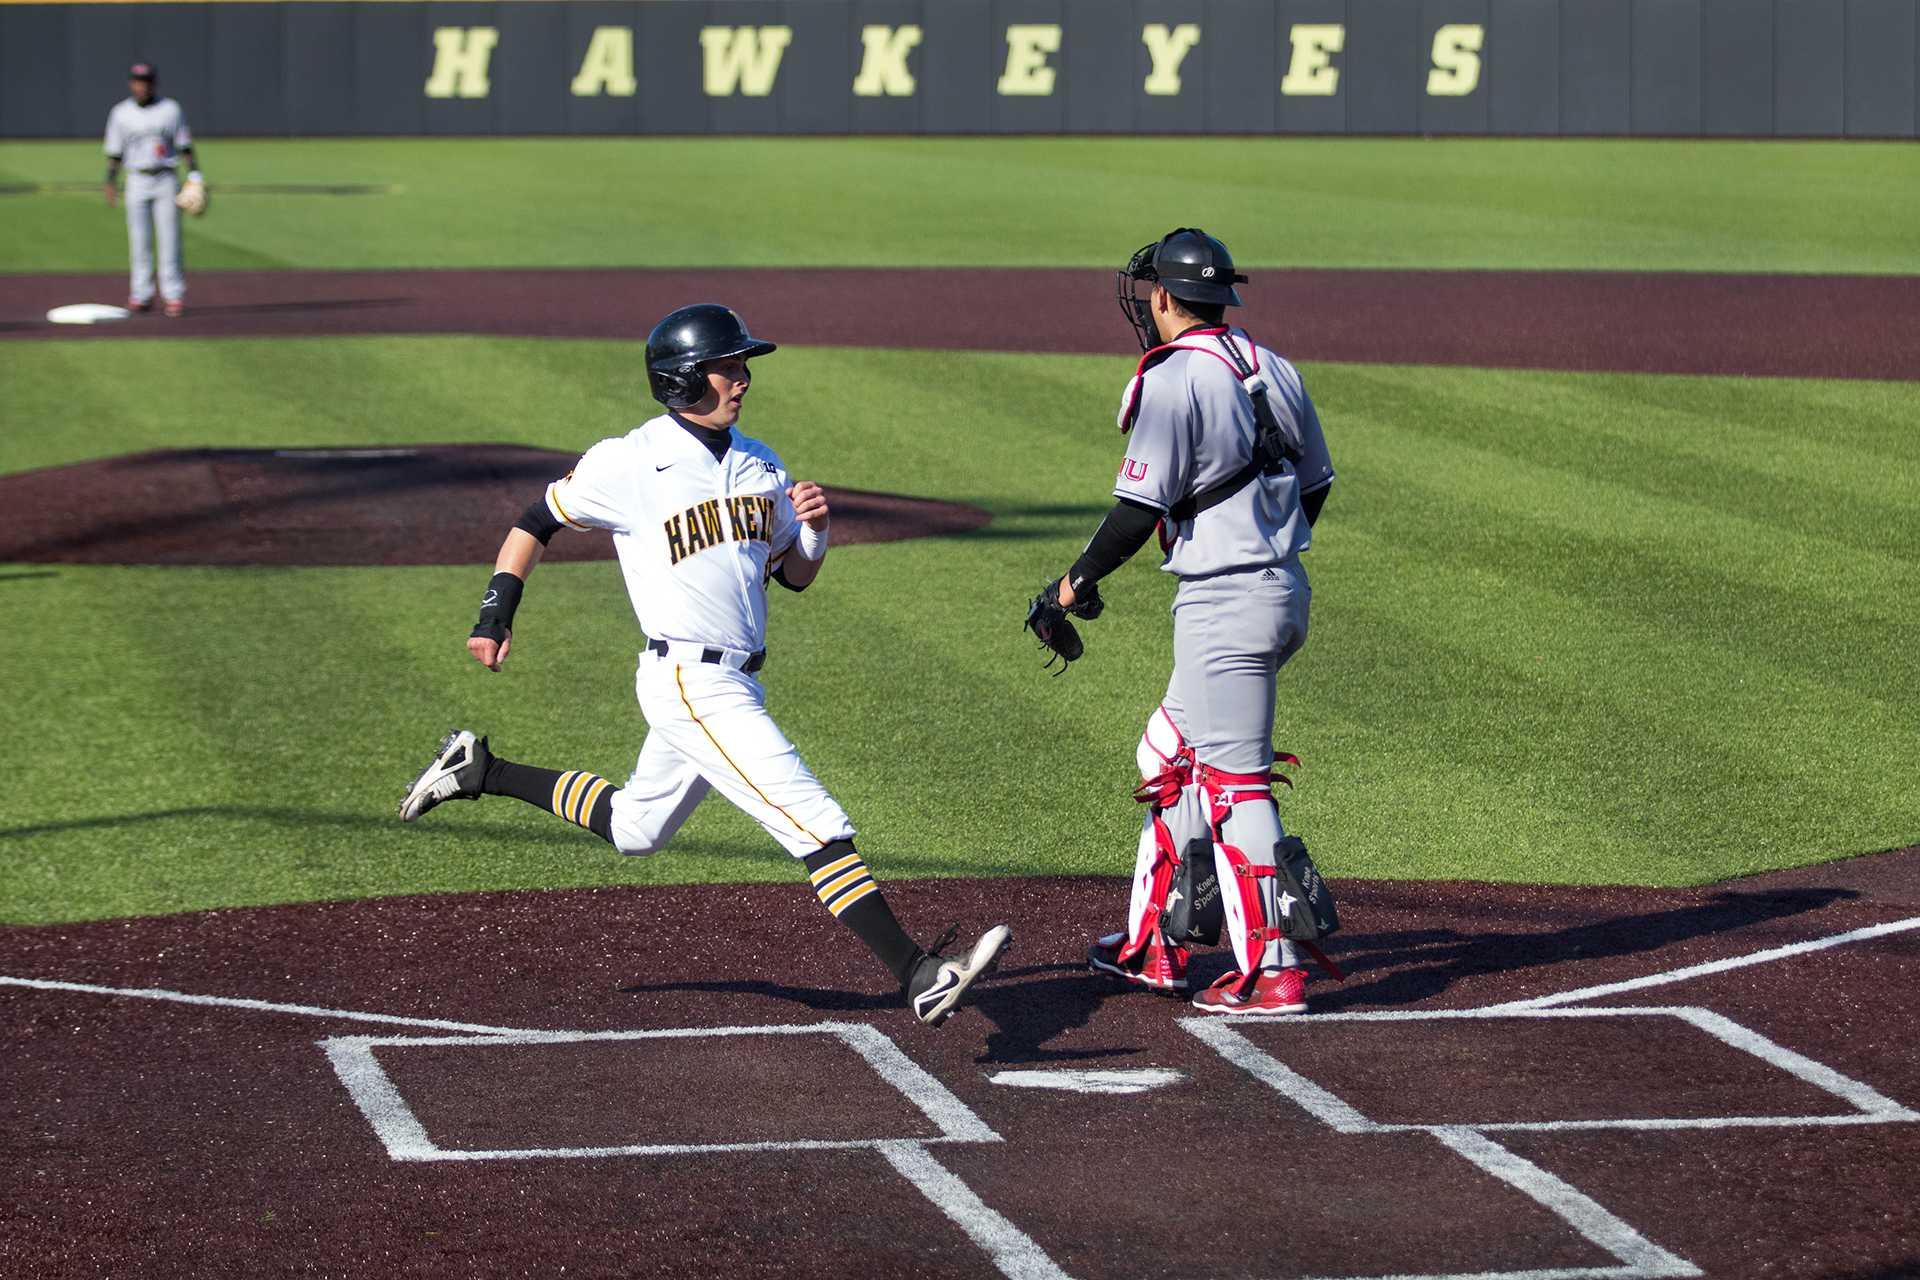 Tyler Cropley scores a run during Iowa baseball vs. Northern Illinois at Banks Field on April 17, 2018. The Hawkeyes won the game 2-0. (Megan Nagorzanski/The Daily Iowan)